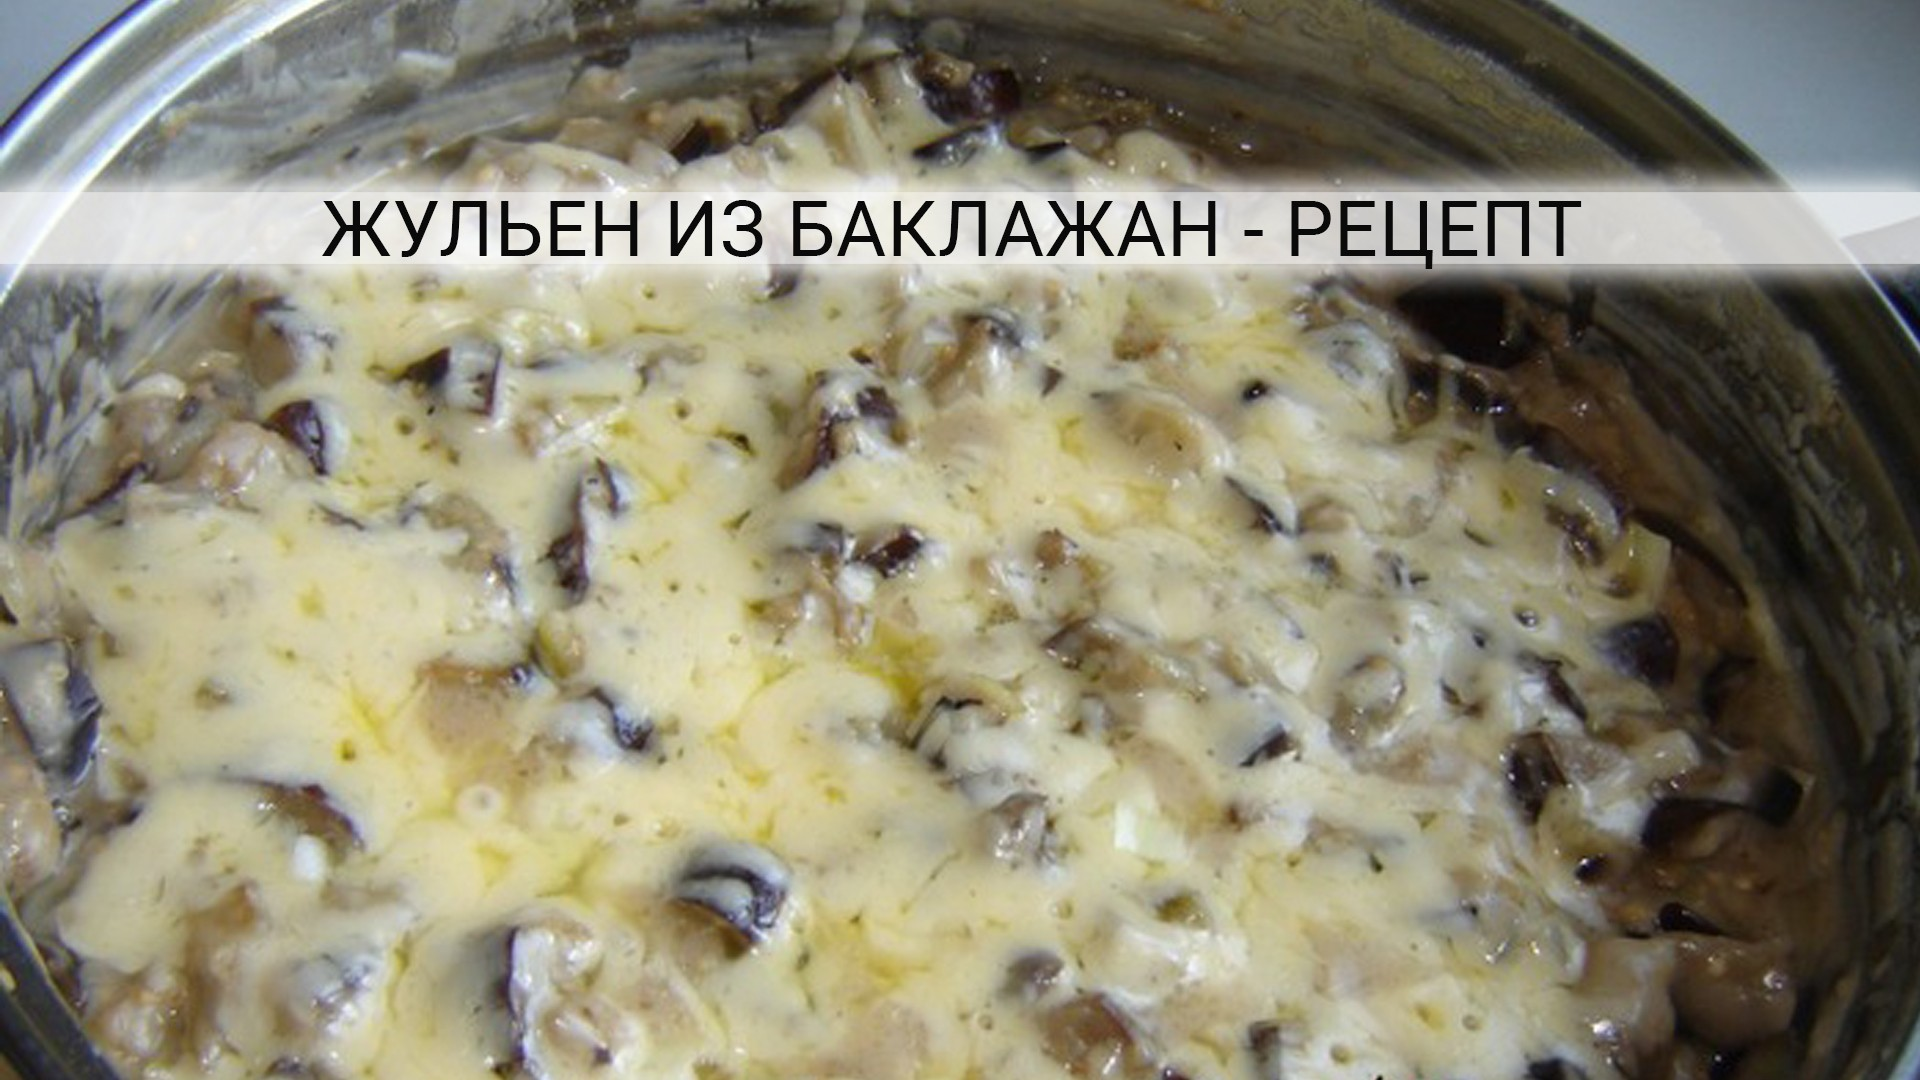 Рецепт из баклажан